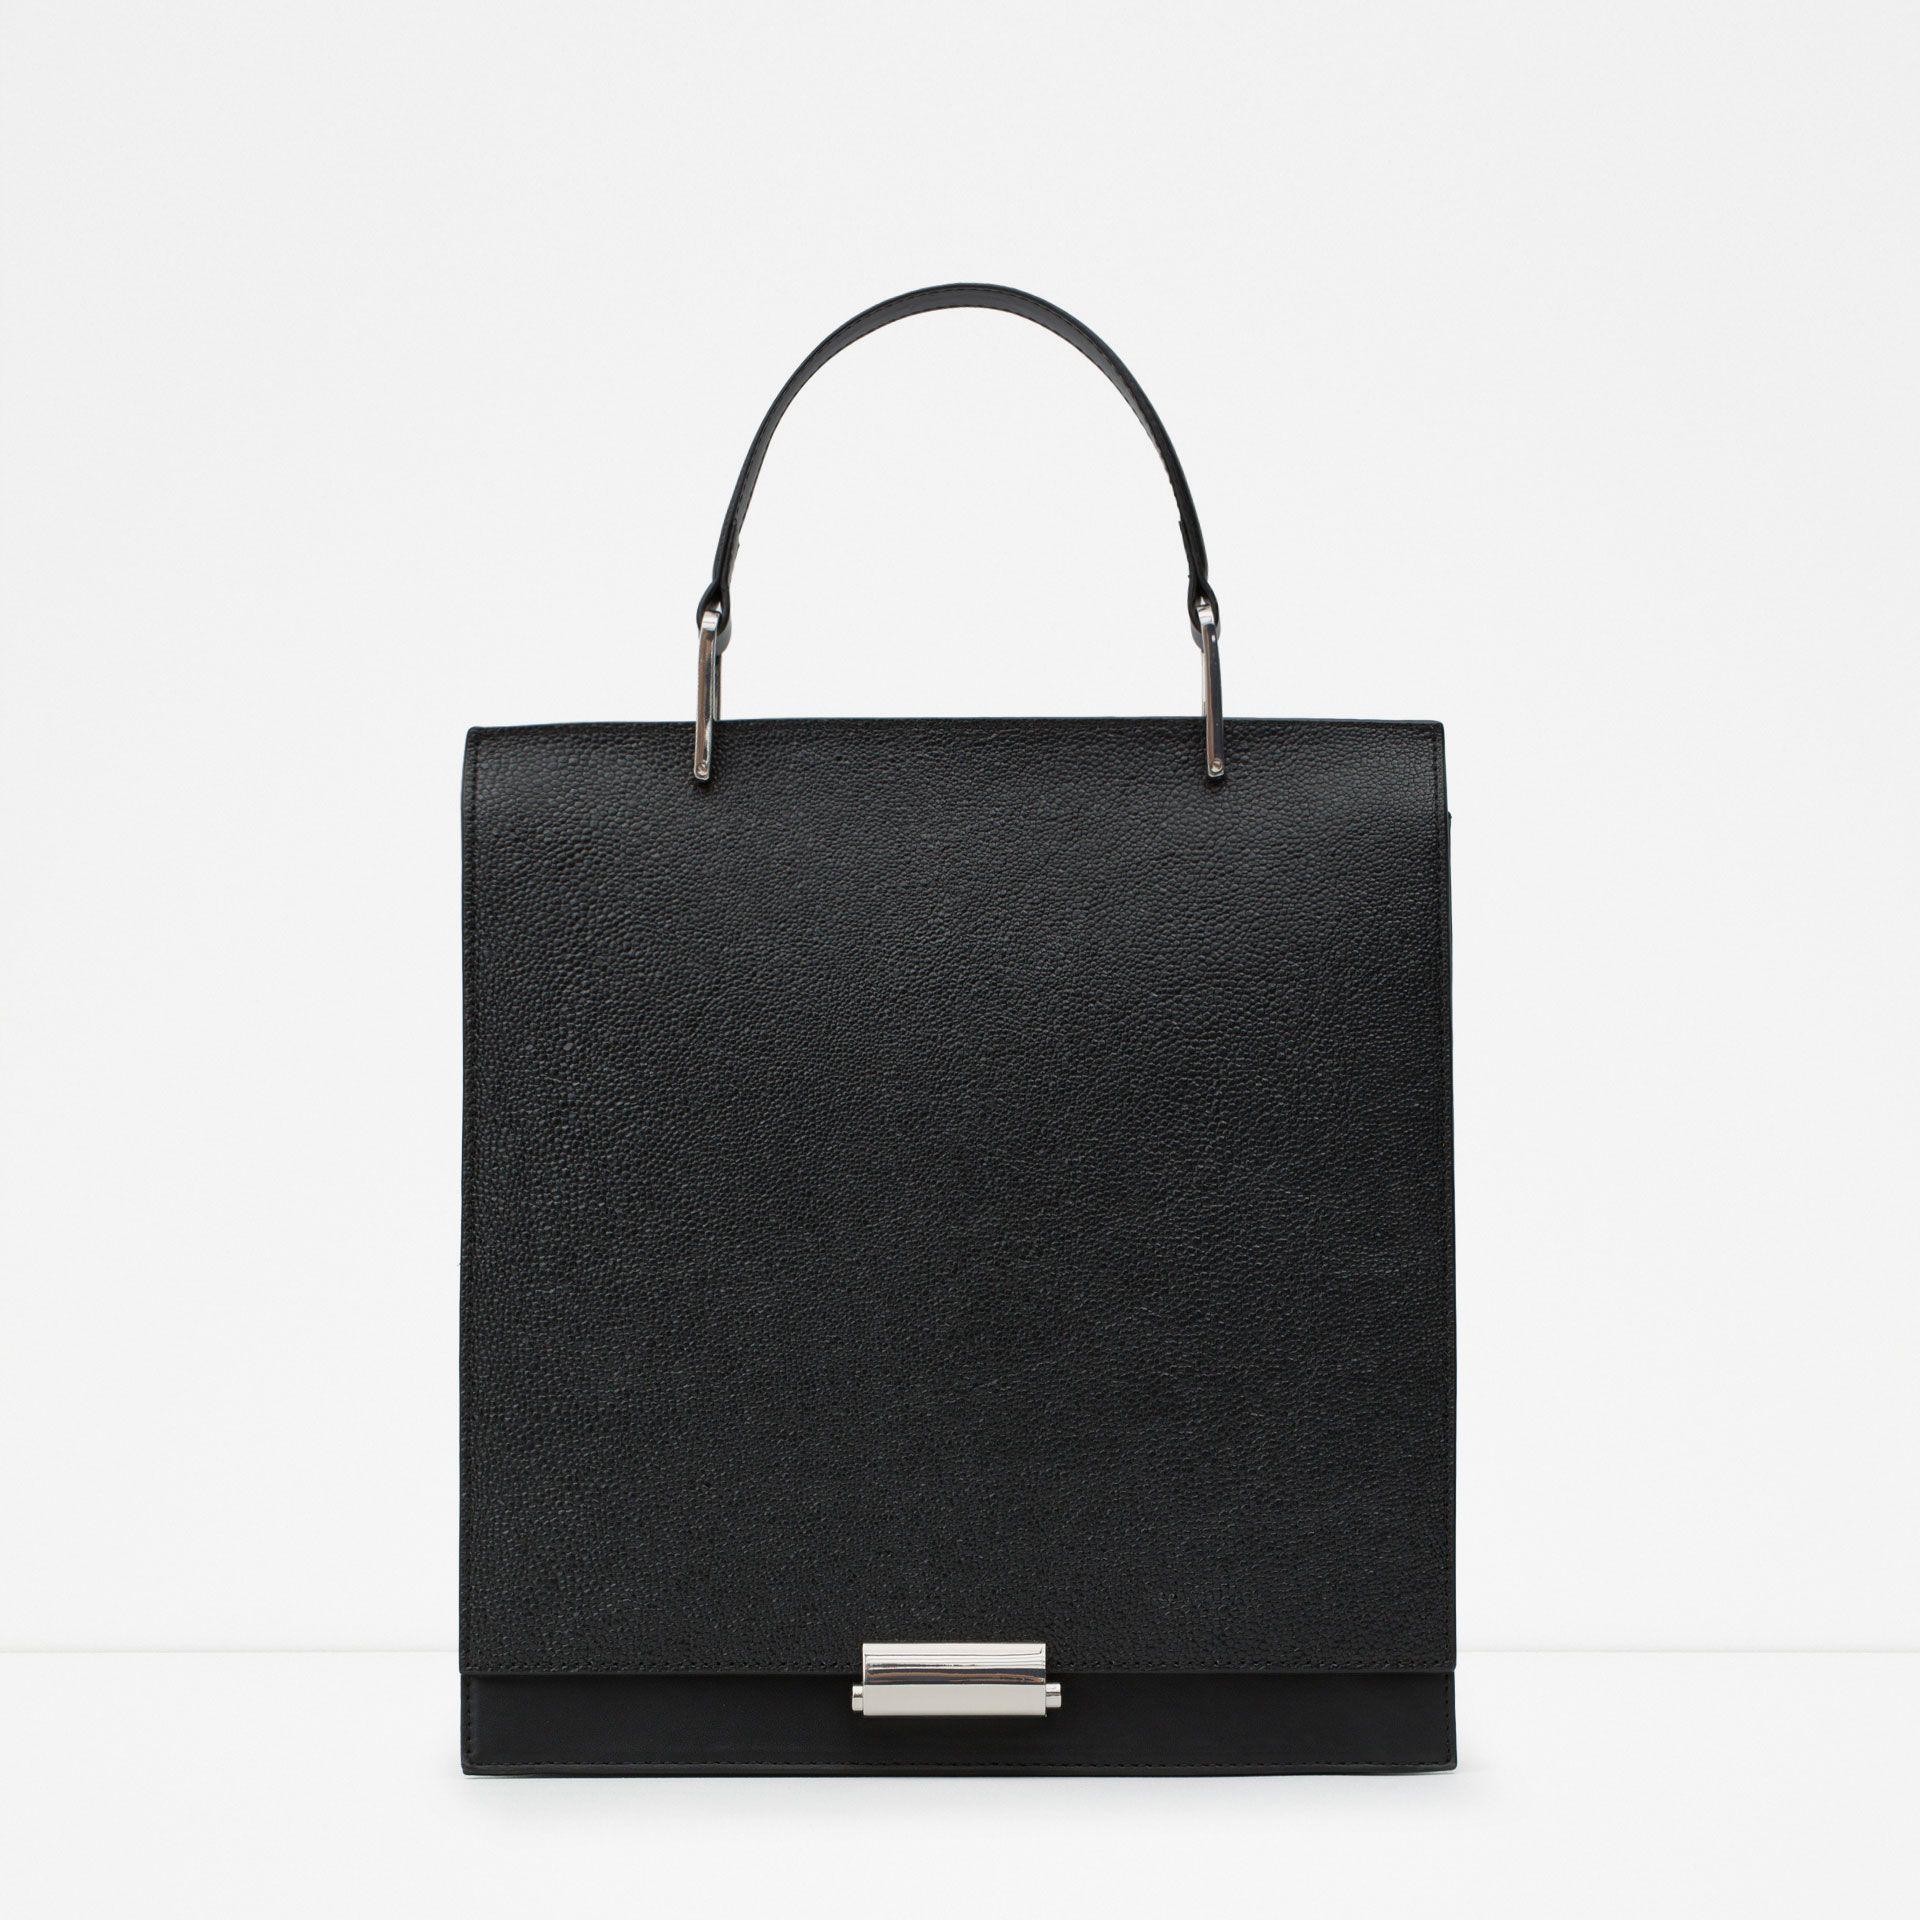 Embossed City Bag Zara Canada Beautiful Handbagsbeautiful